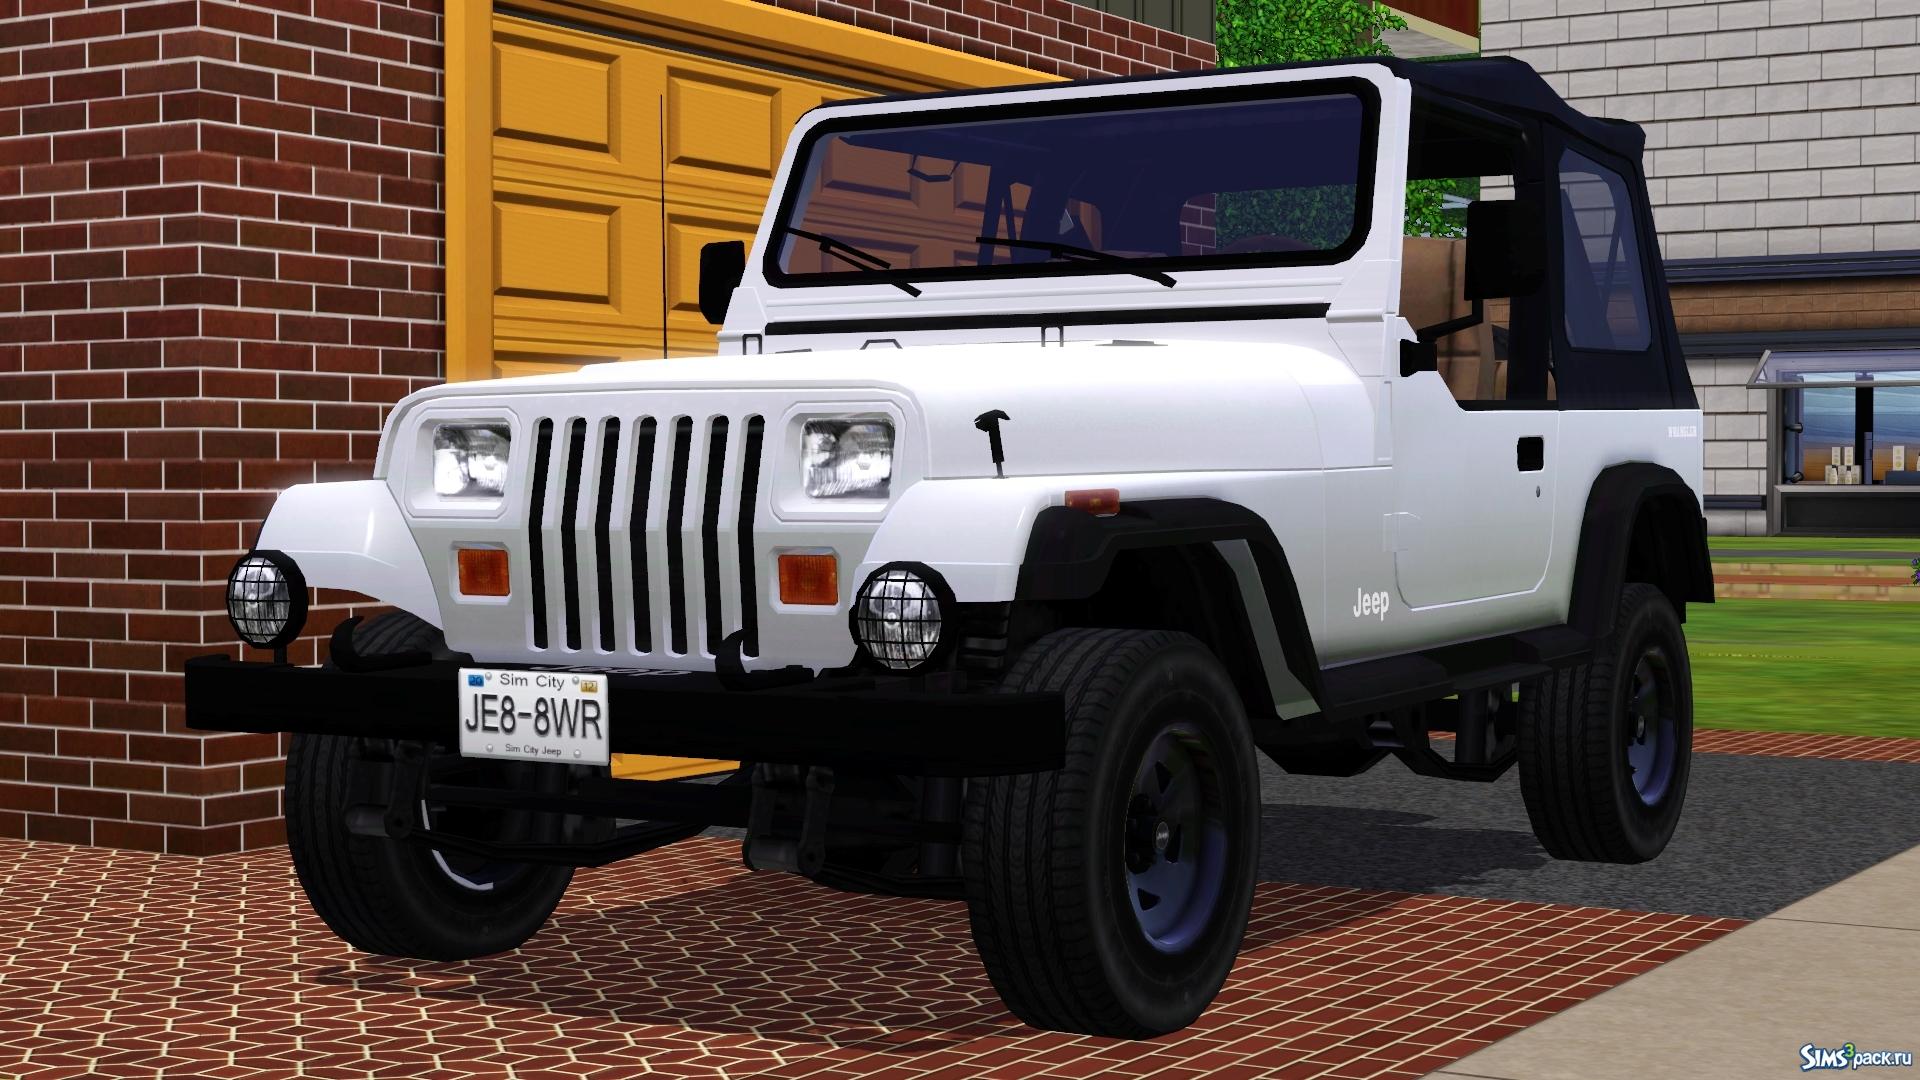 Jeep Wrangler Hemi >> Скачать автомобиль Jeep Wrangler 1988 от Fresh-Prince для ...